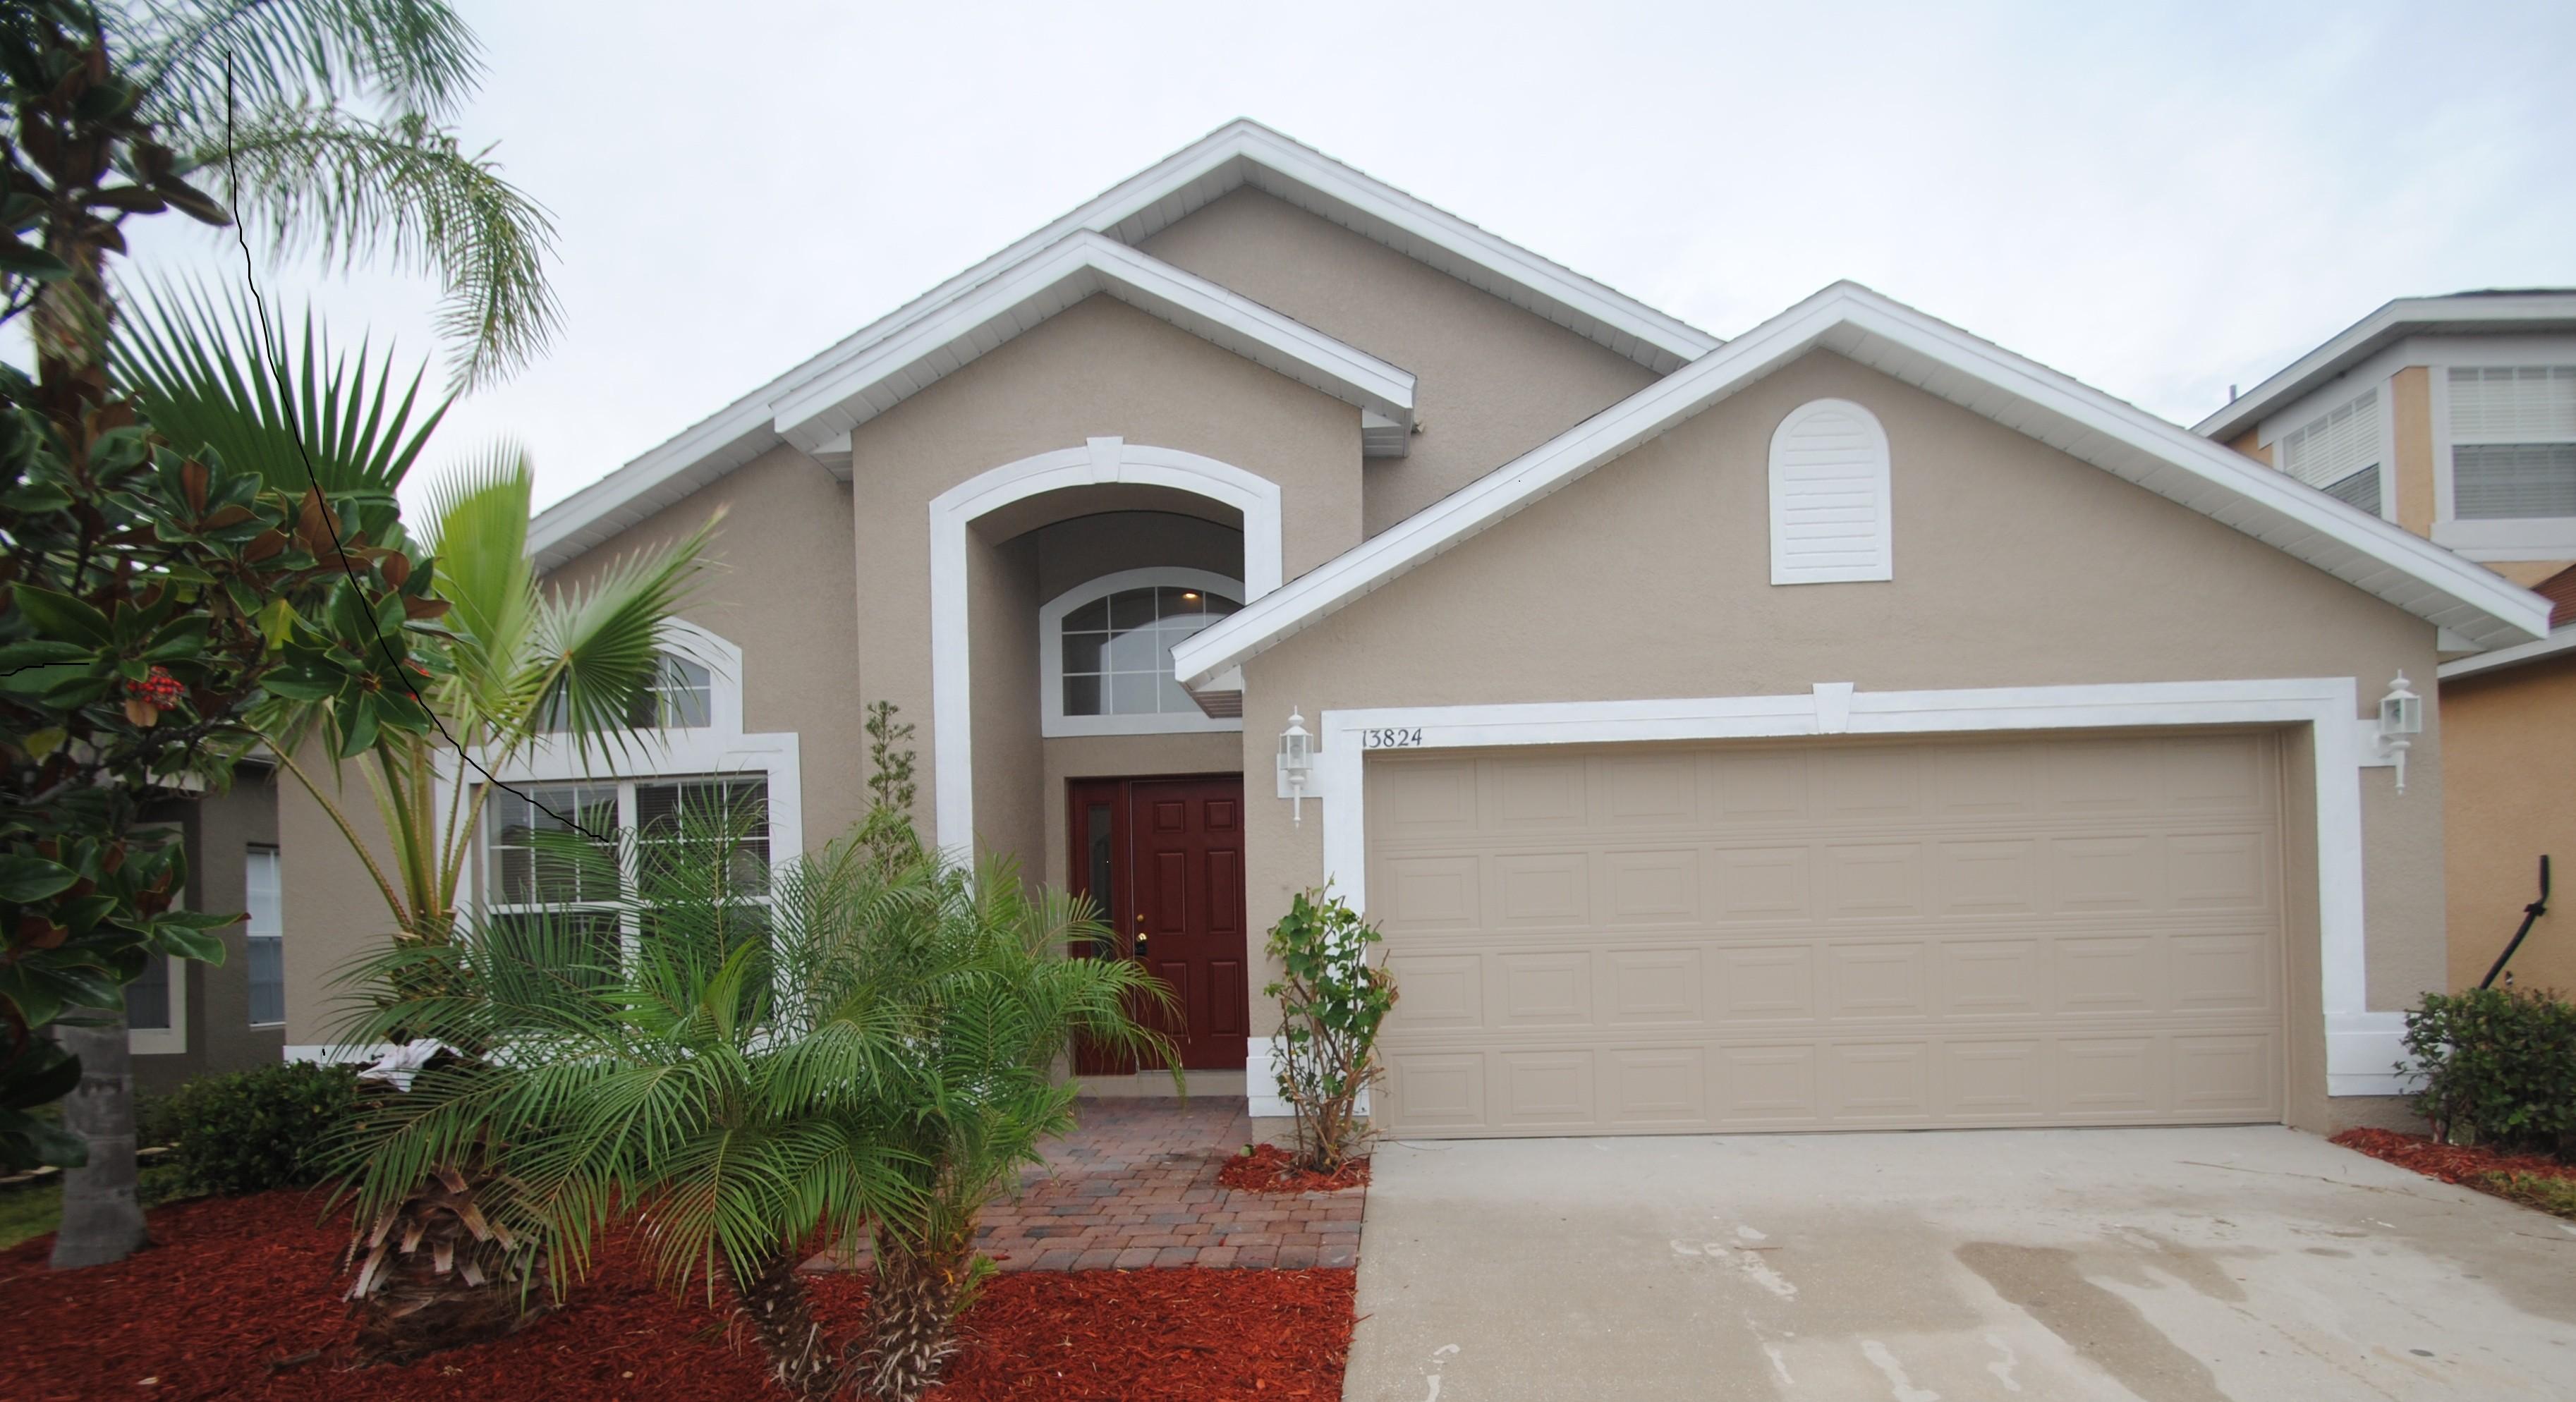 13824 Morning Frost Dr Orlando Fl 32828 4 Bedroom House For Rent For 1 725 Month Zumper